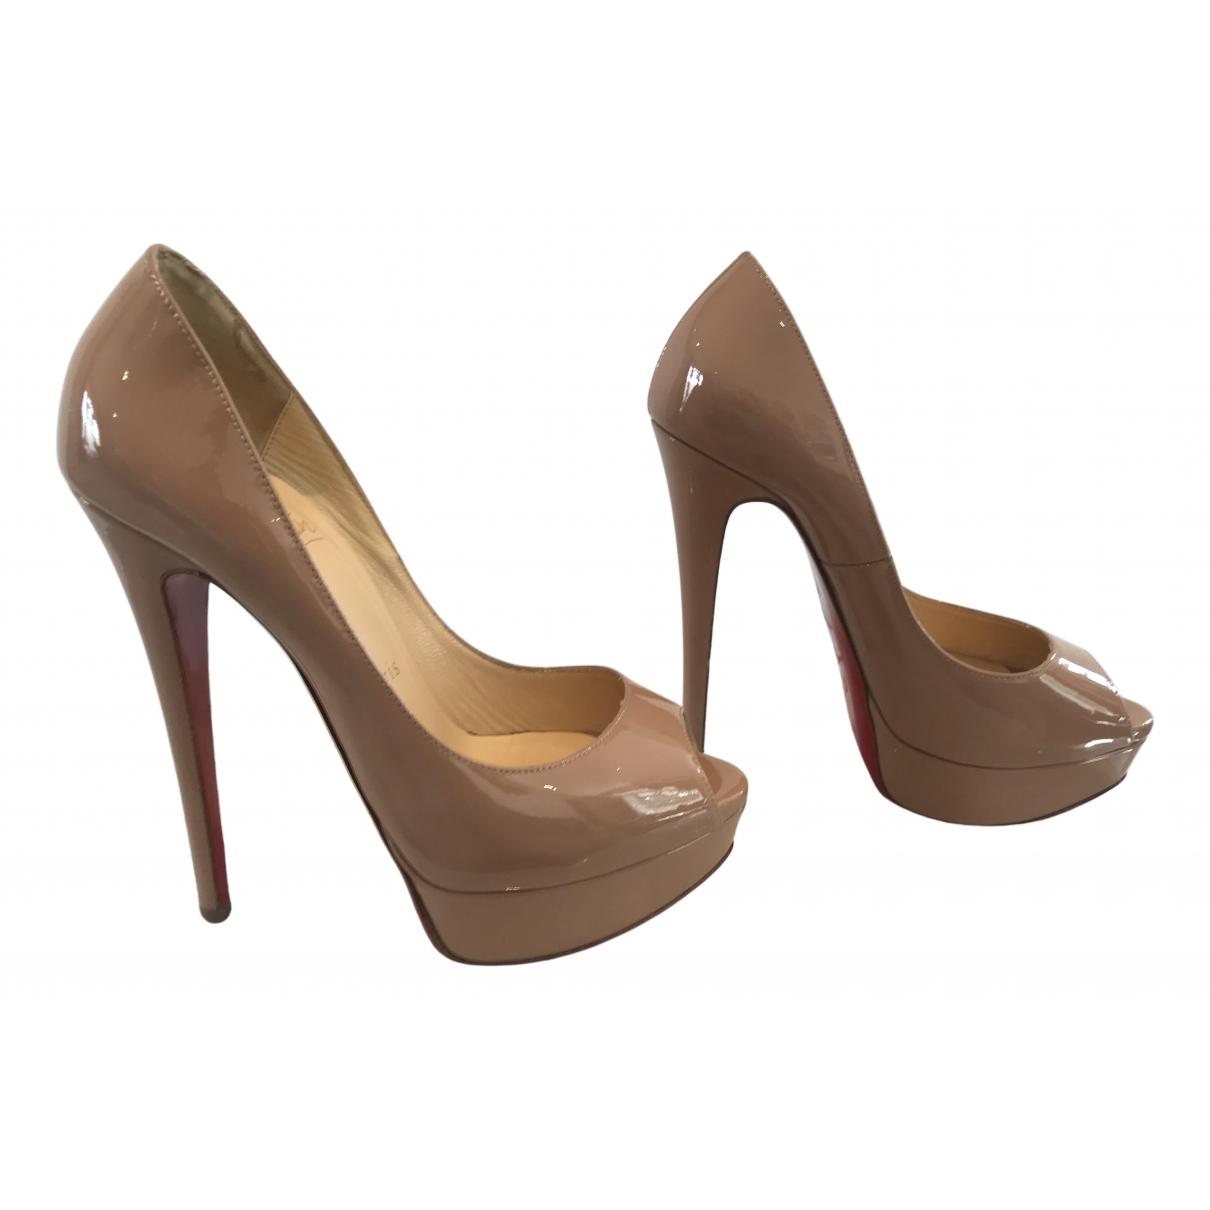 Christian Louboutin Lady Peep Beige Patent leather Heels for Women 37 EU